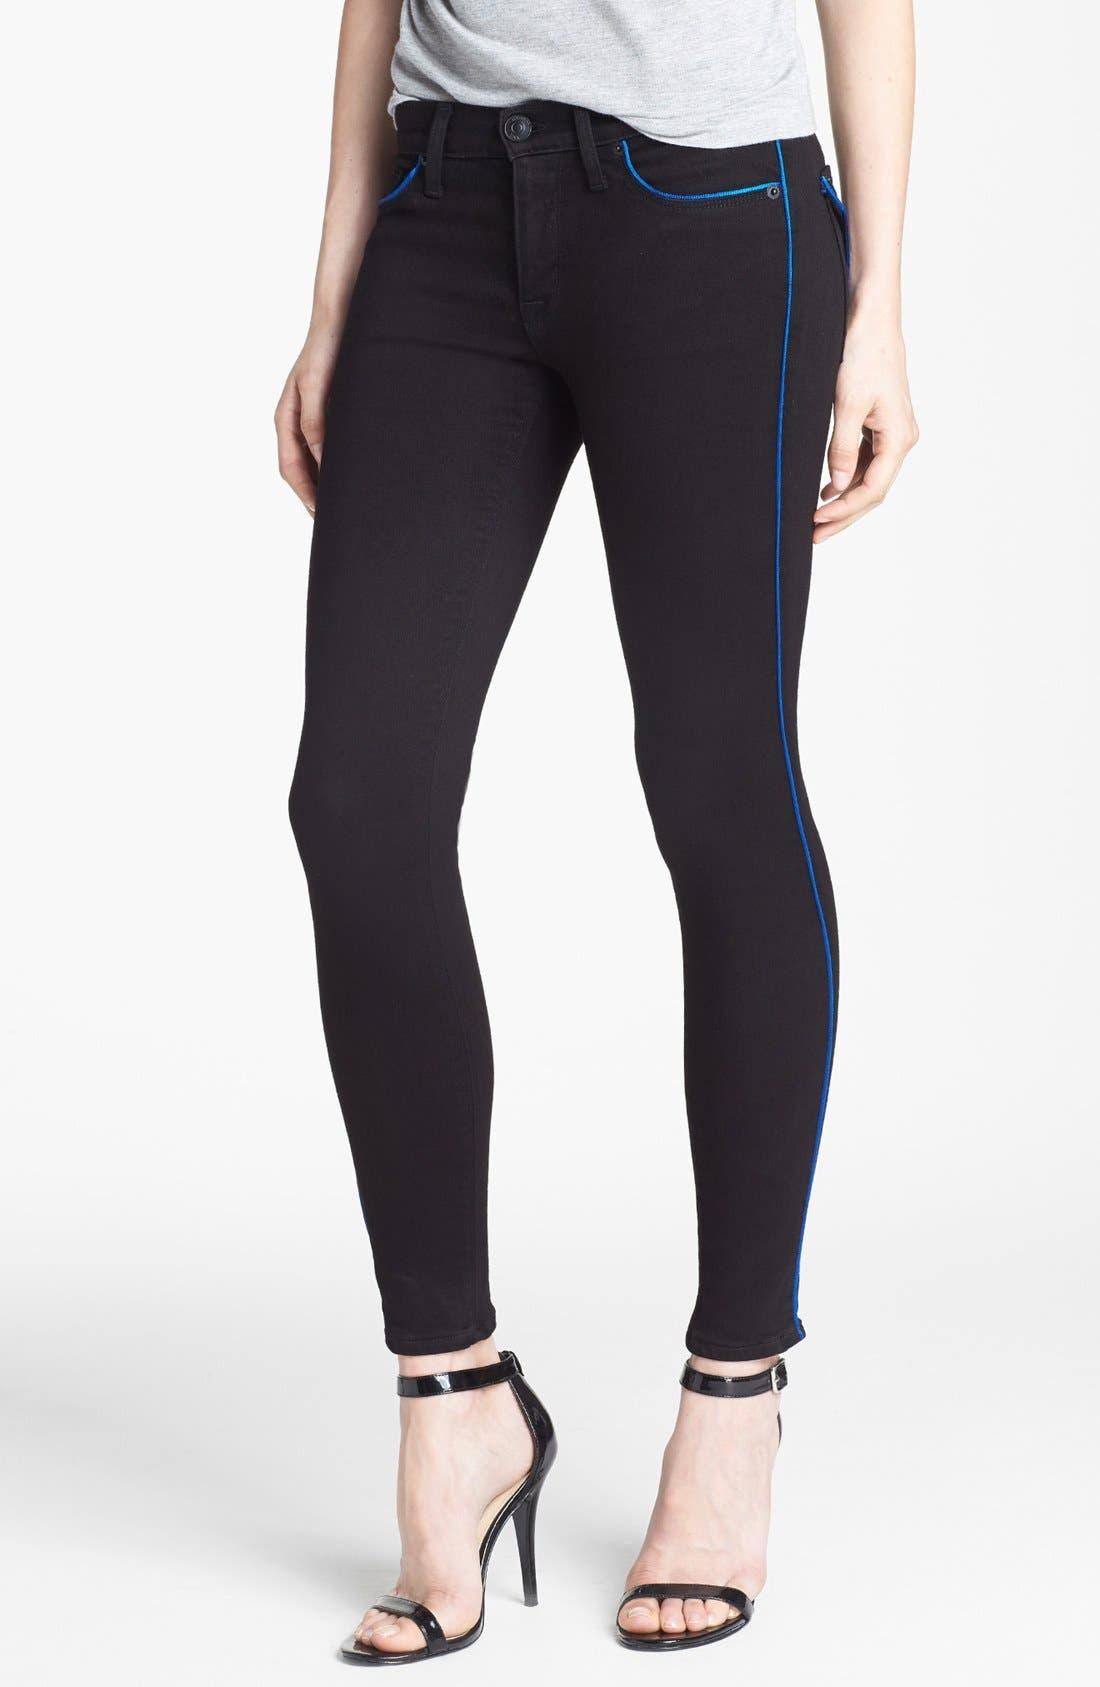 Alternate Image 1 Selected - Hudson Jeans Piped Super Skinny Jeans (Cadet)